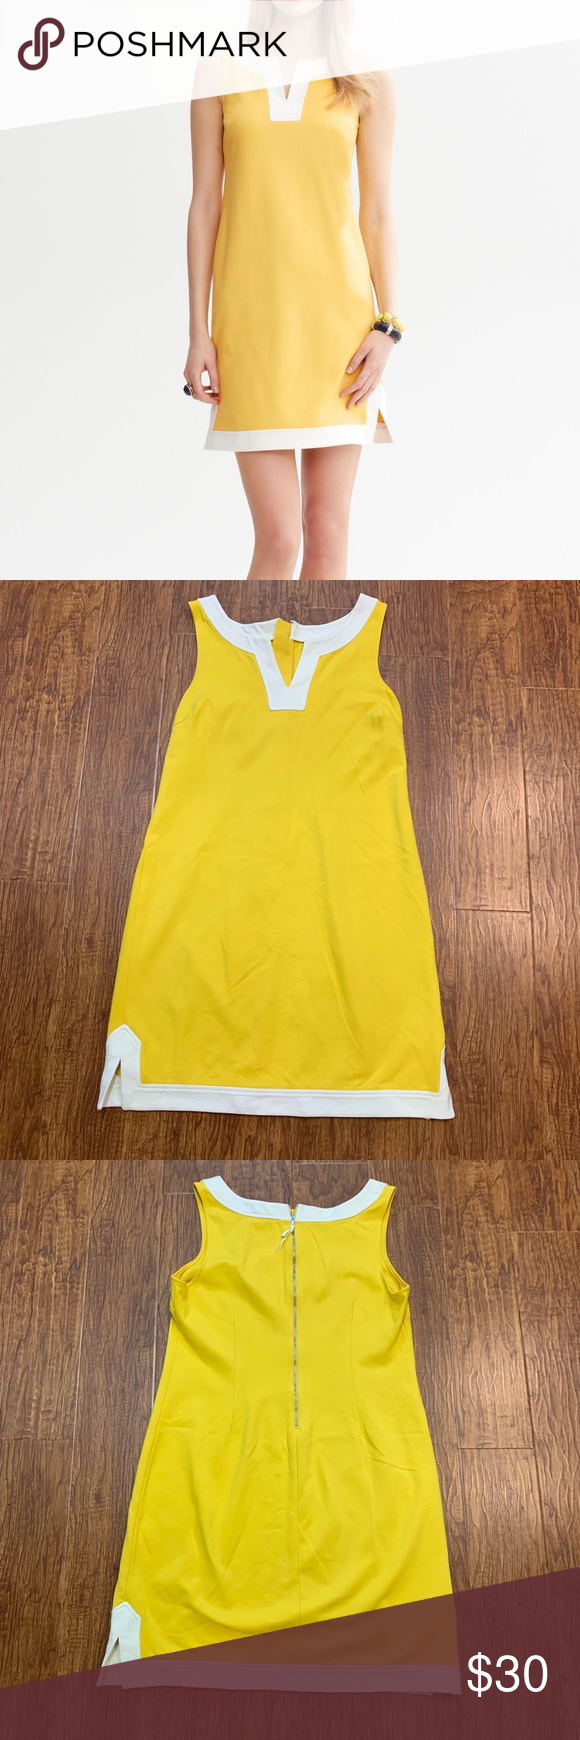 Banana Republic Yellow And White Shift Dress 6 White Shift Dresses Shift Dress Dresses [ 1740 x 580 Pixel ]